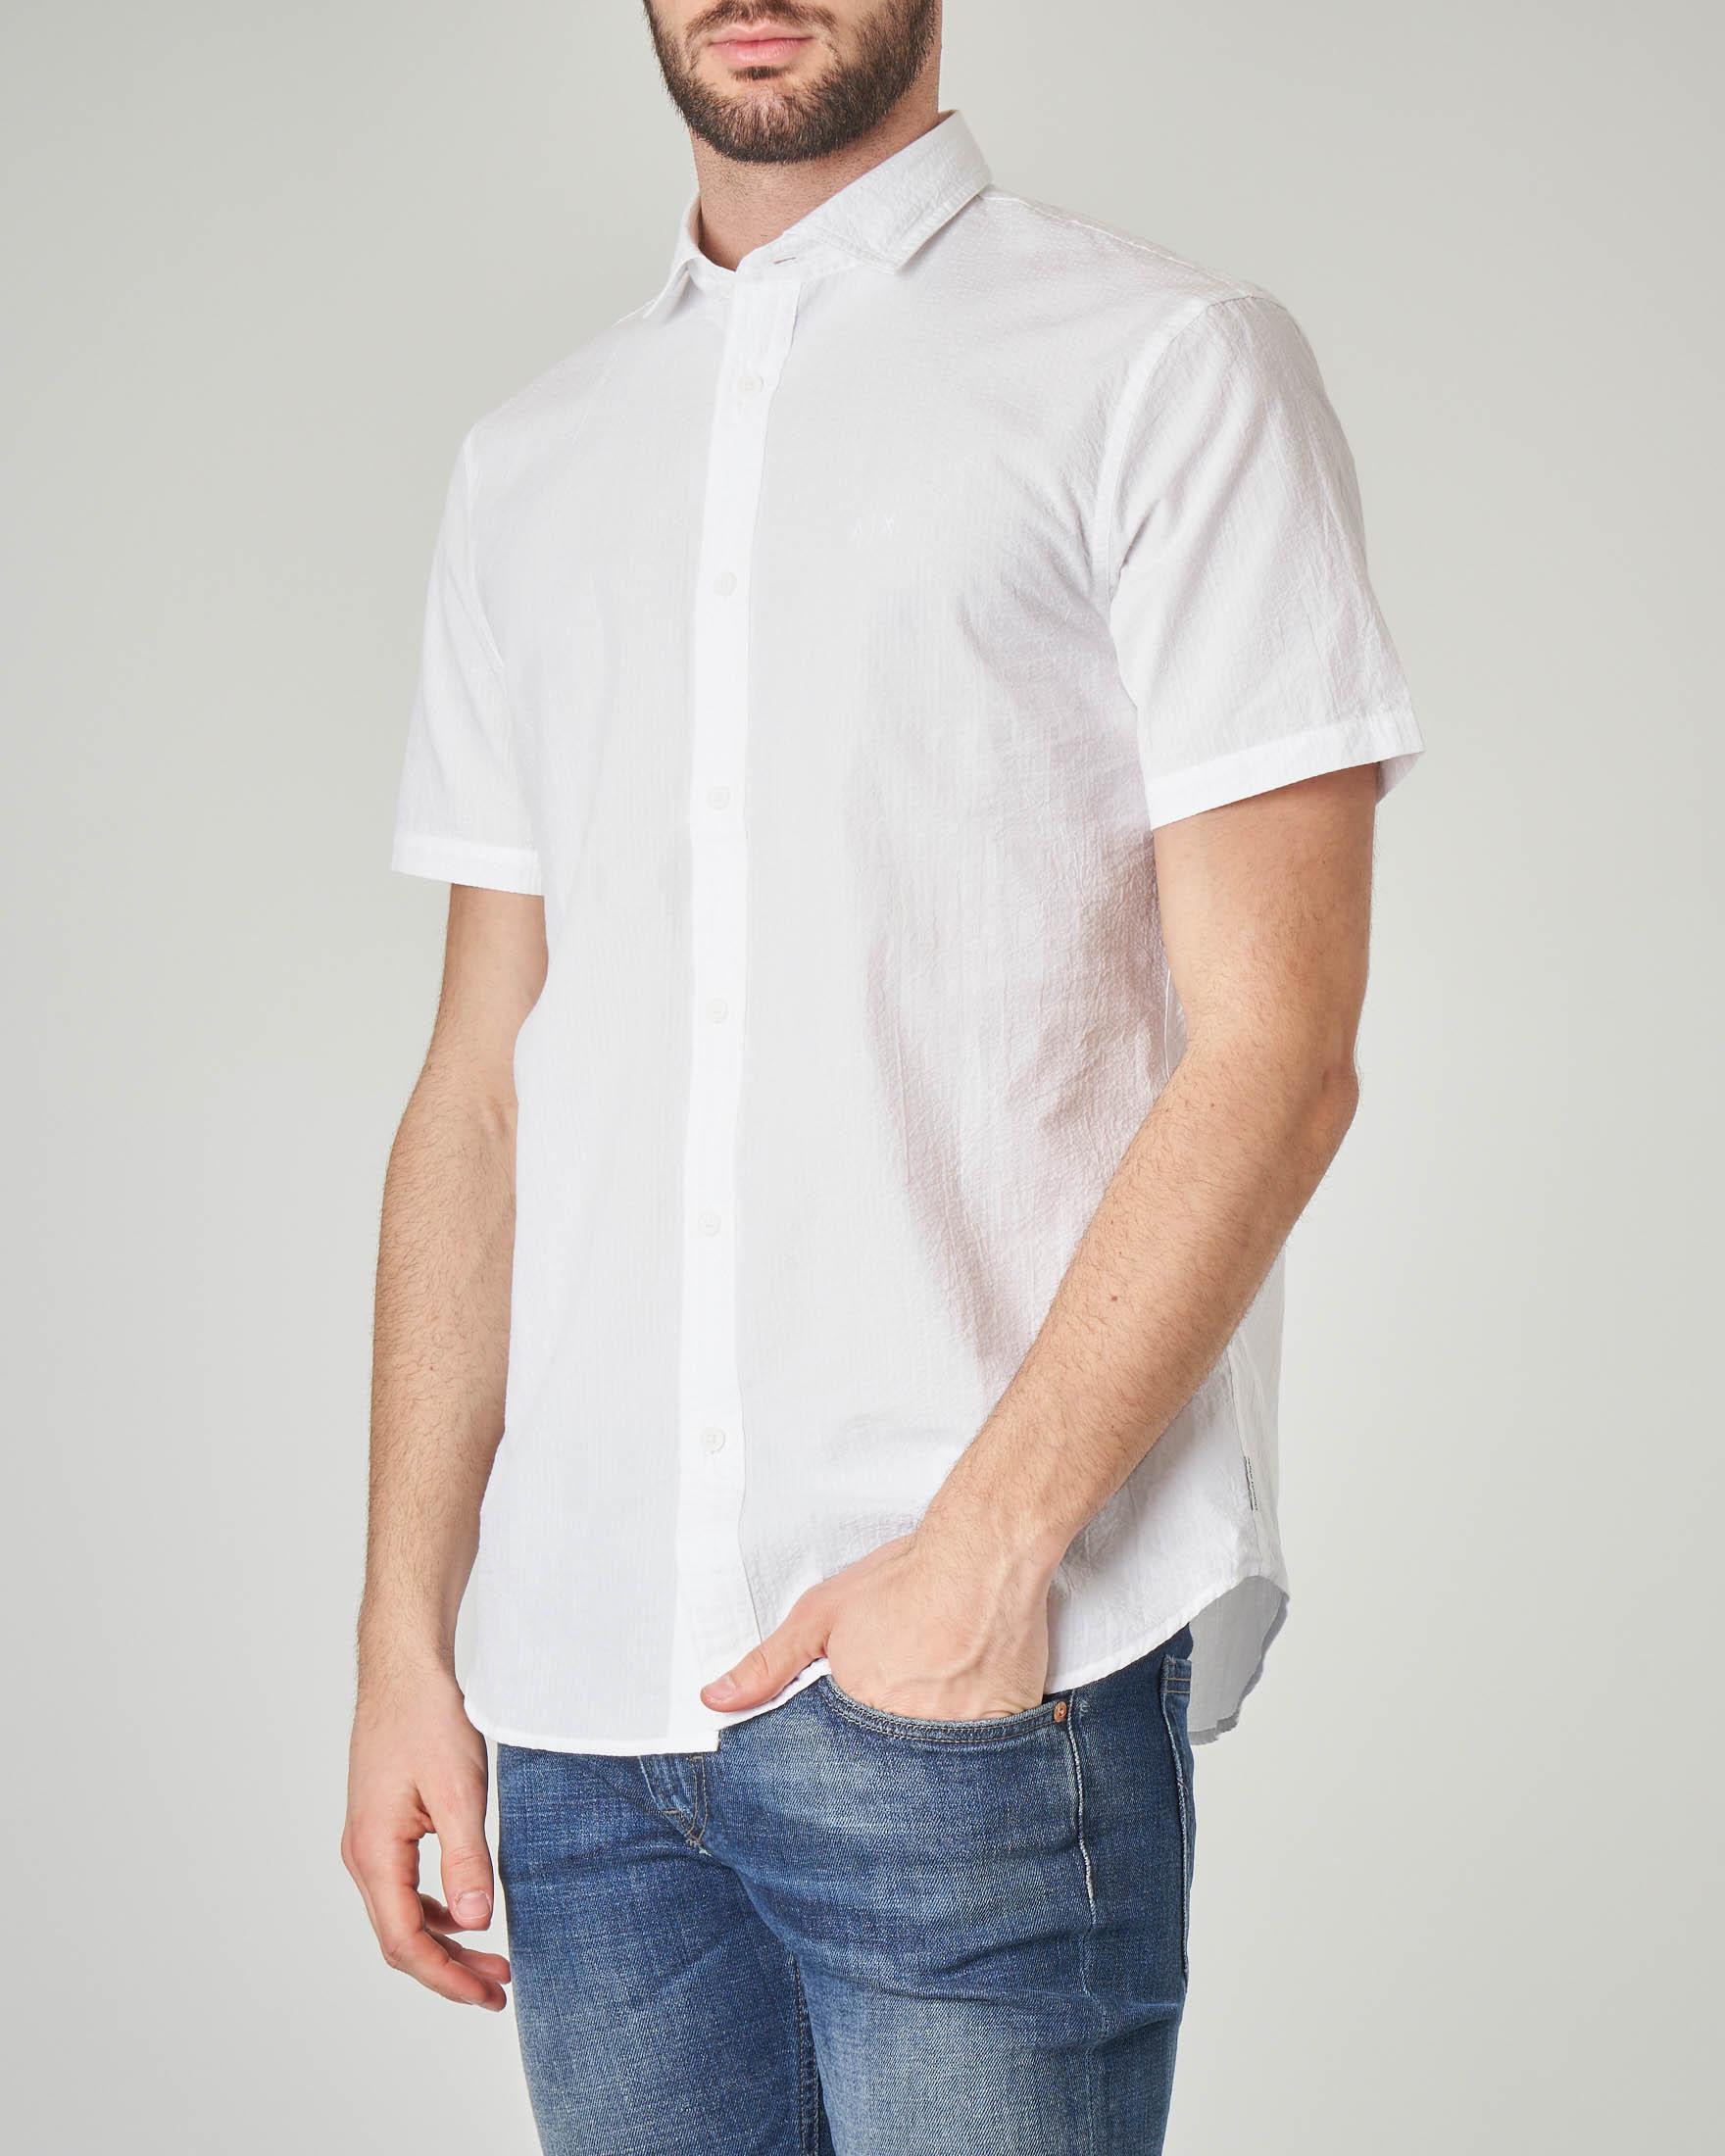 Camicia bianca mezza manica